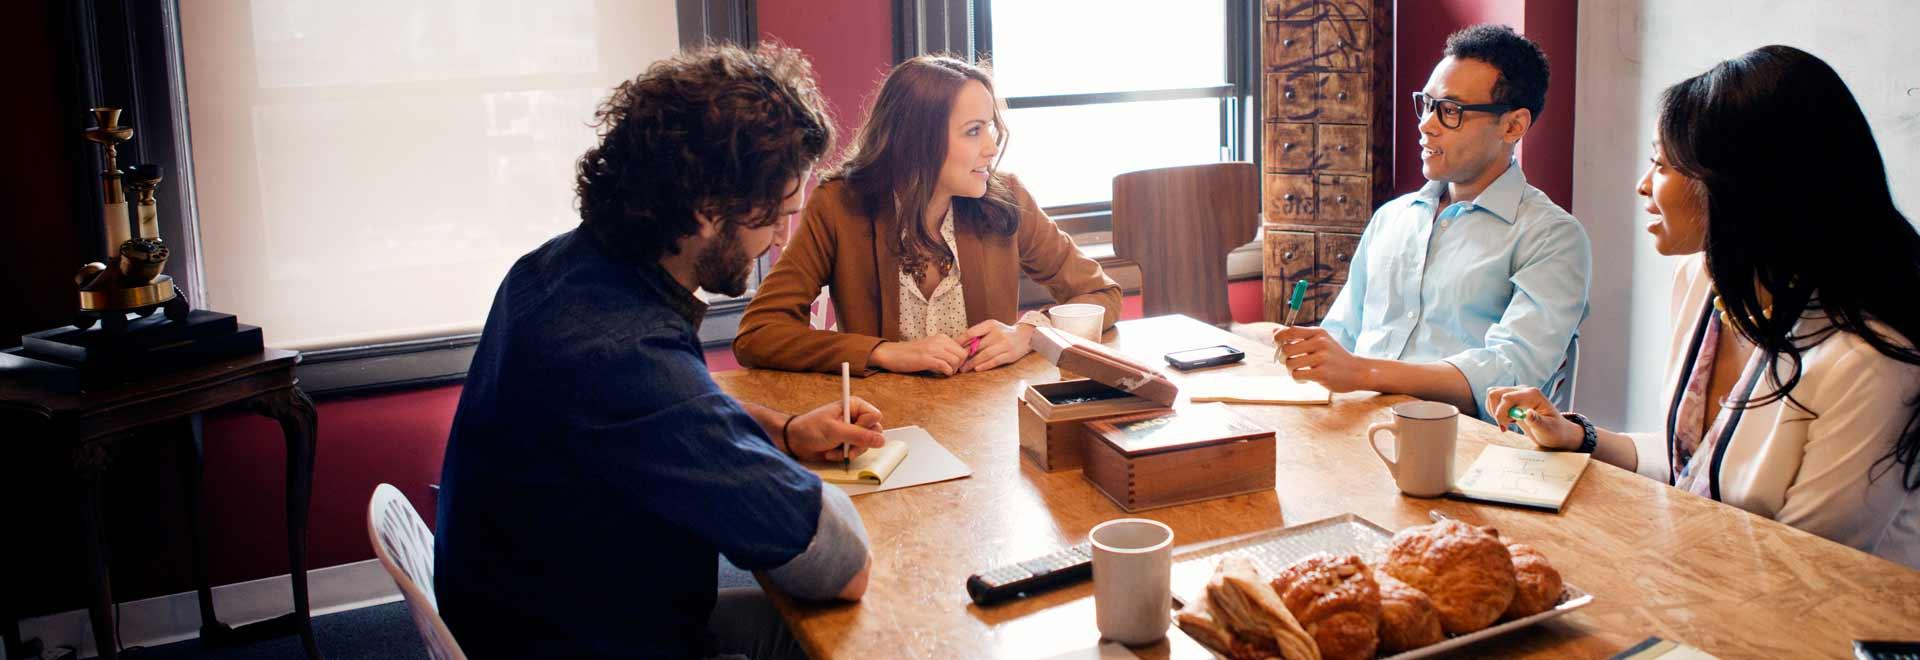 Četiri osobe rade u kancelariji pomoću plana Office 365 Enterprise E3.